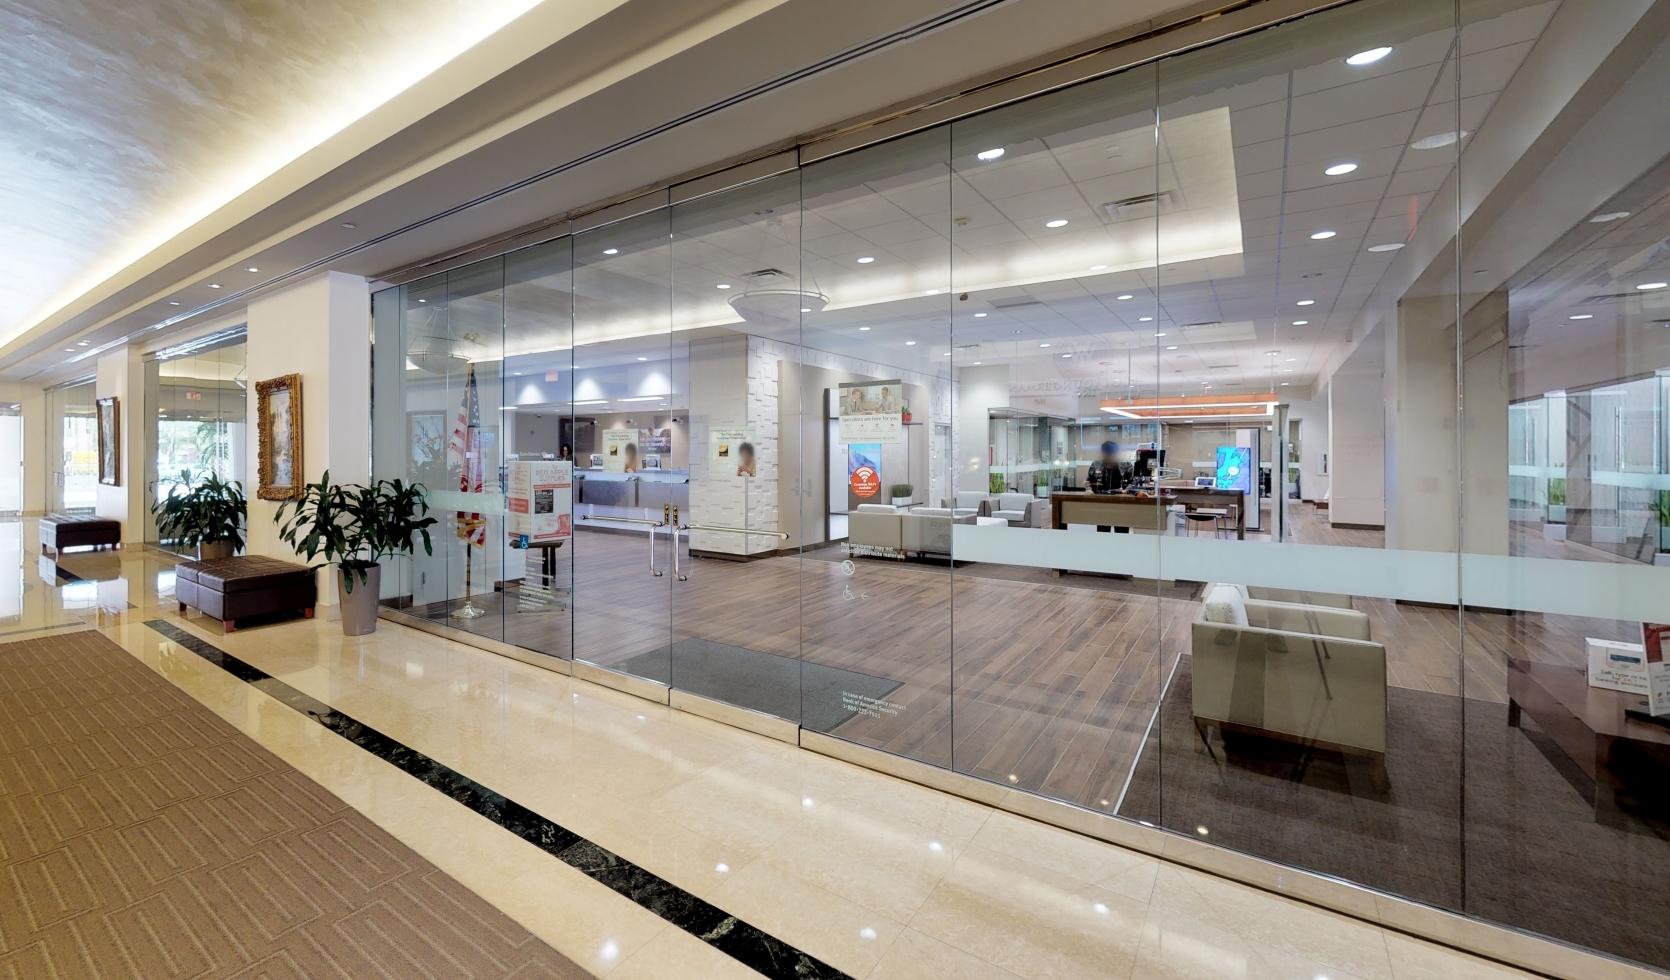 Bank of America financial center with drive-thru ATM   150 E Palmetto Park Rd STE 106, Boca Raton, FL 33432